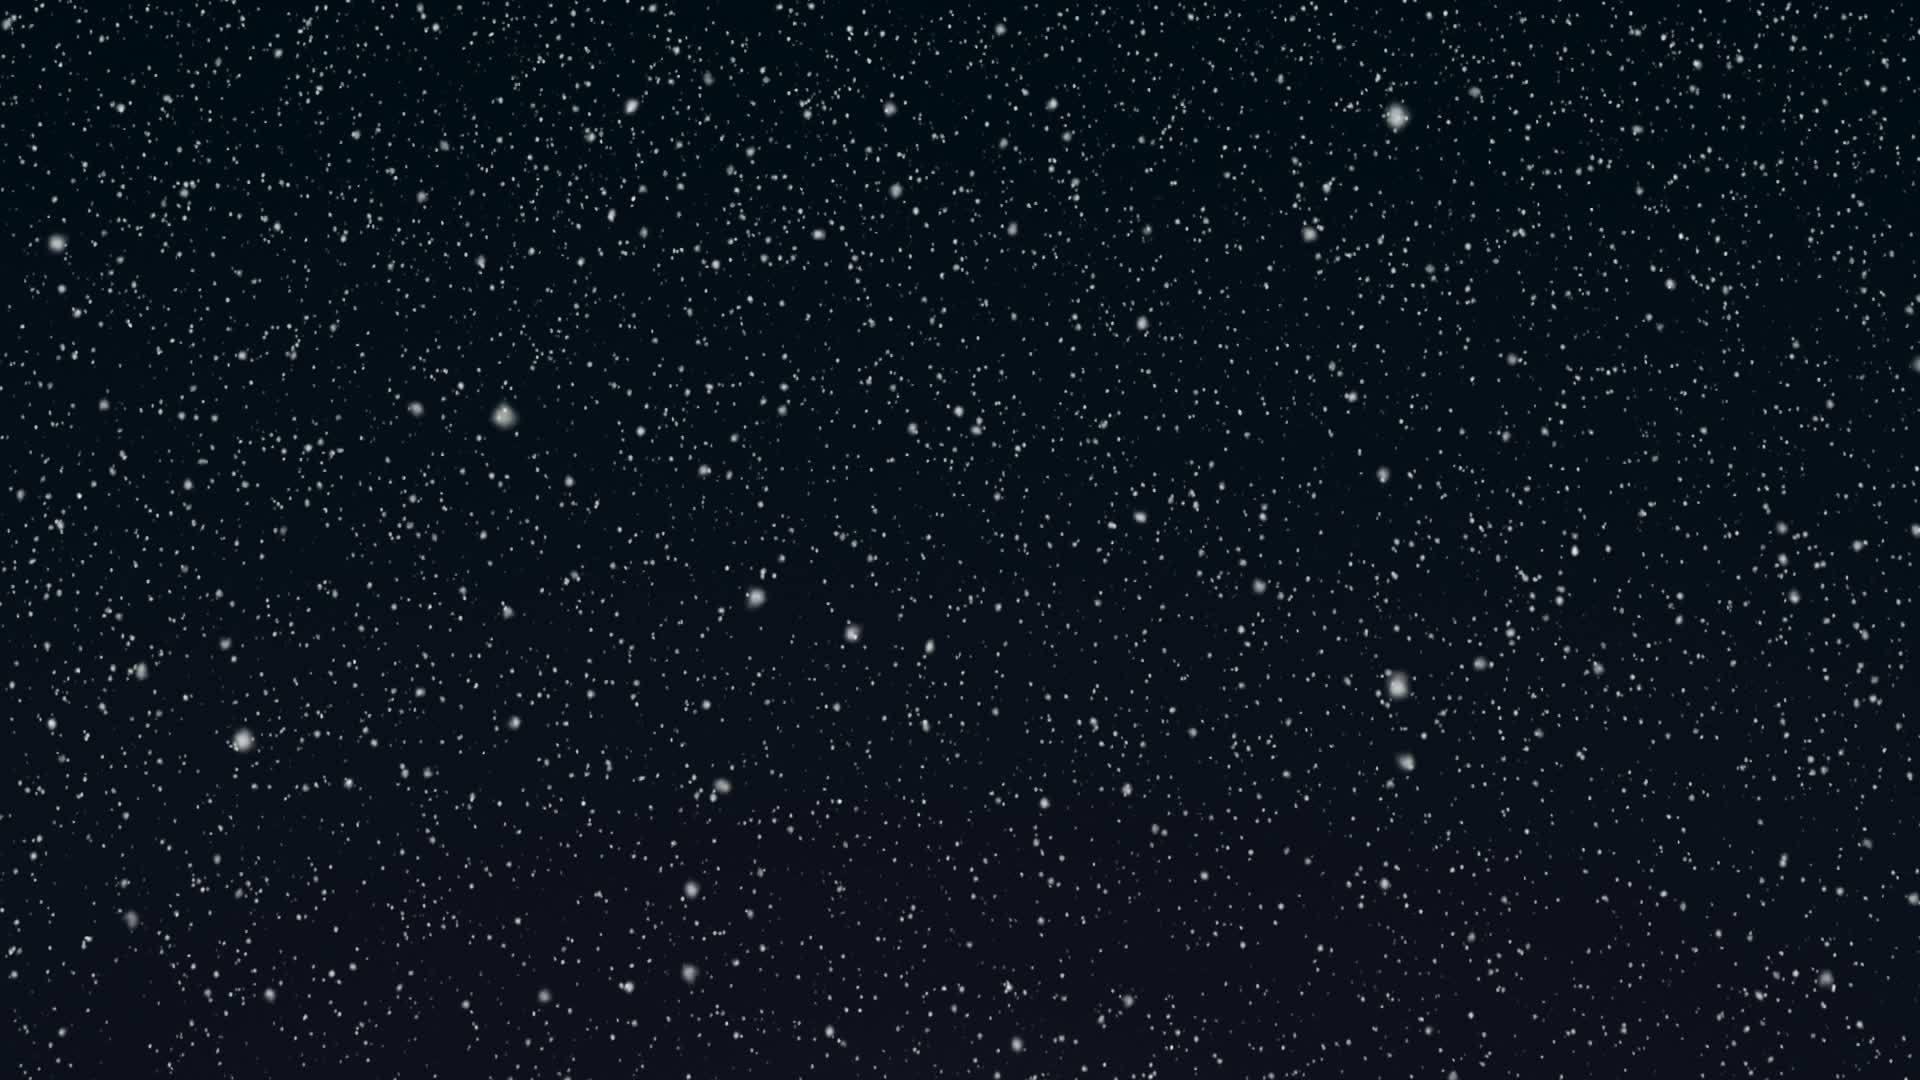 gentle-snowfall-at-night_4460x4460.